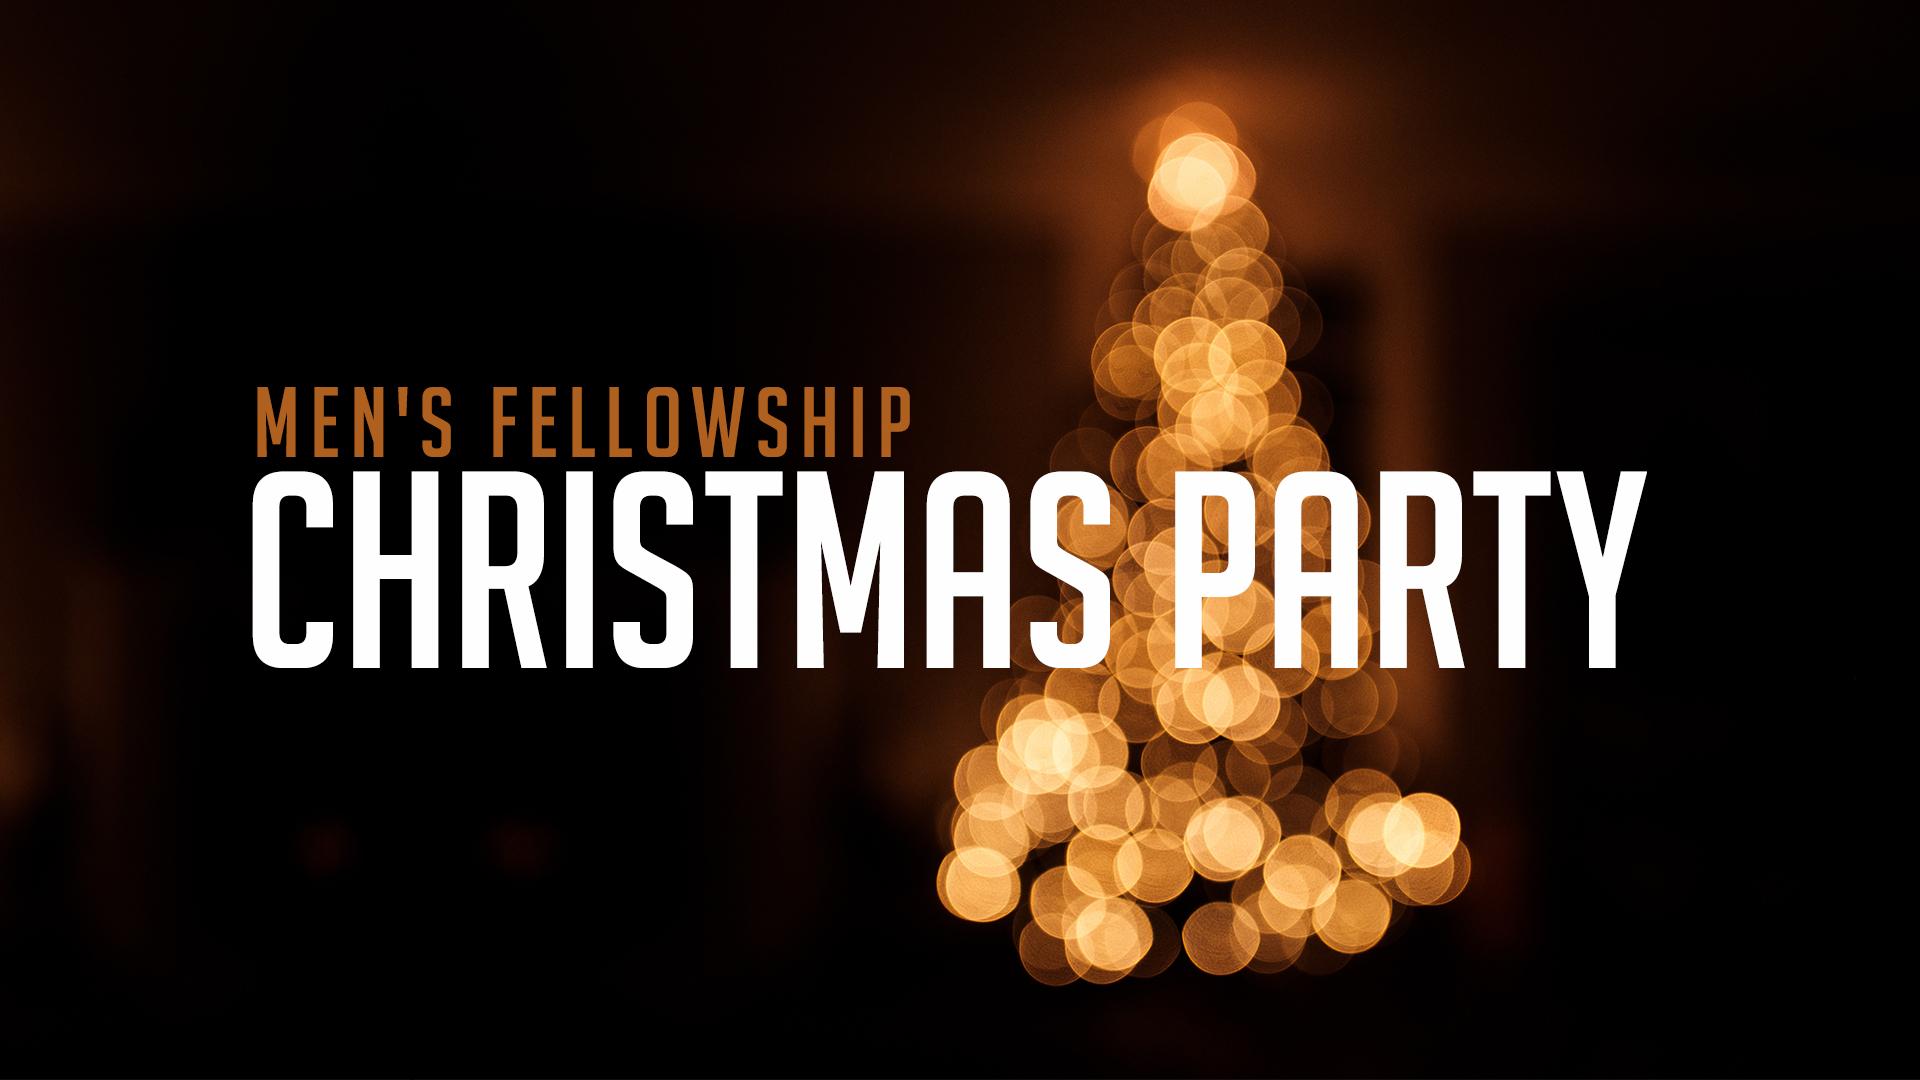 Men's Fellowship Christmas Party.jpg